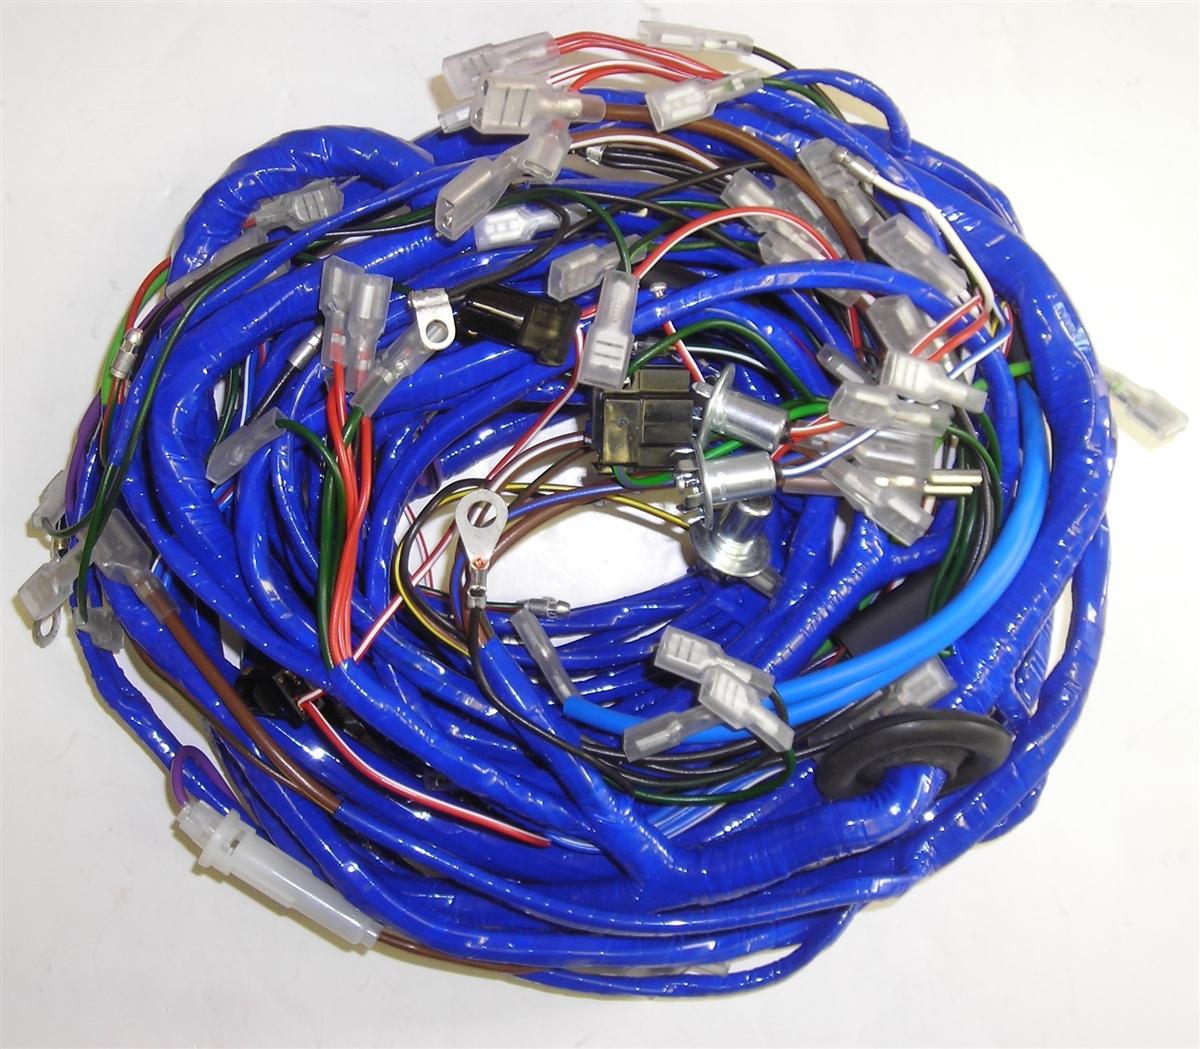 wrapping wiring harness circuit diagram symbols u2022 rh blogospheree com Ford Wiring Harness Kits Automotive Wiring Harness